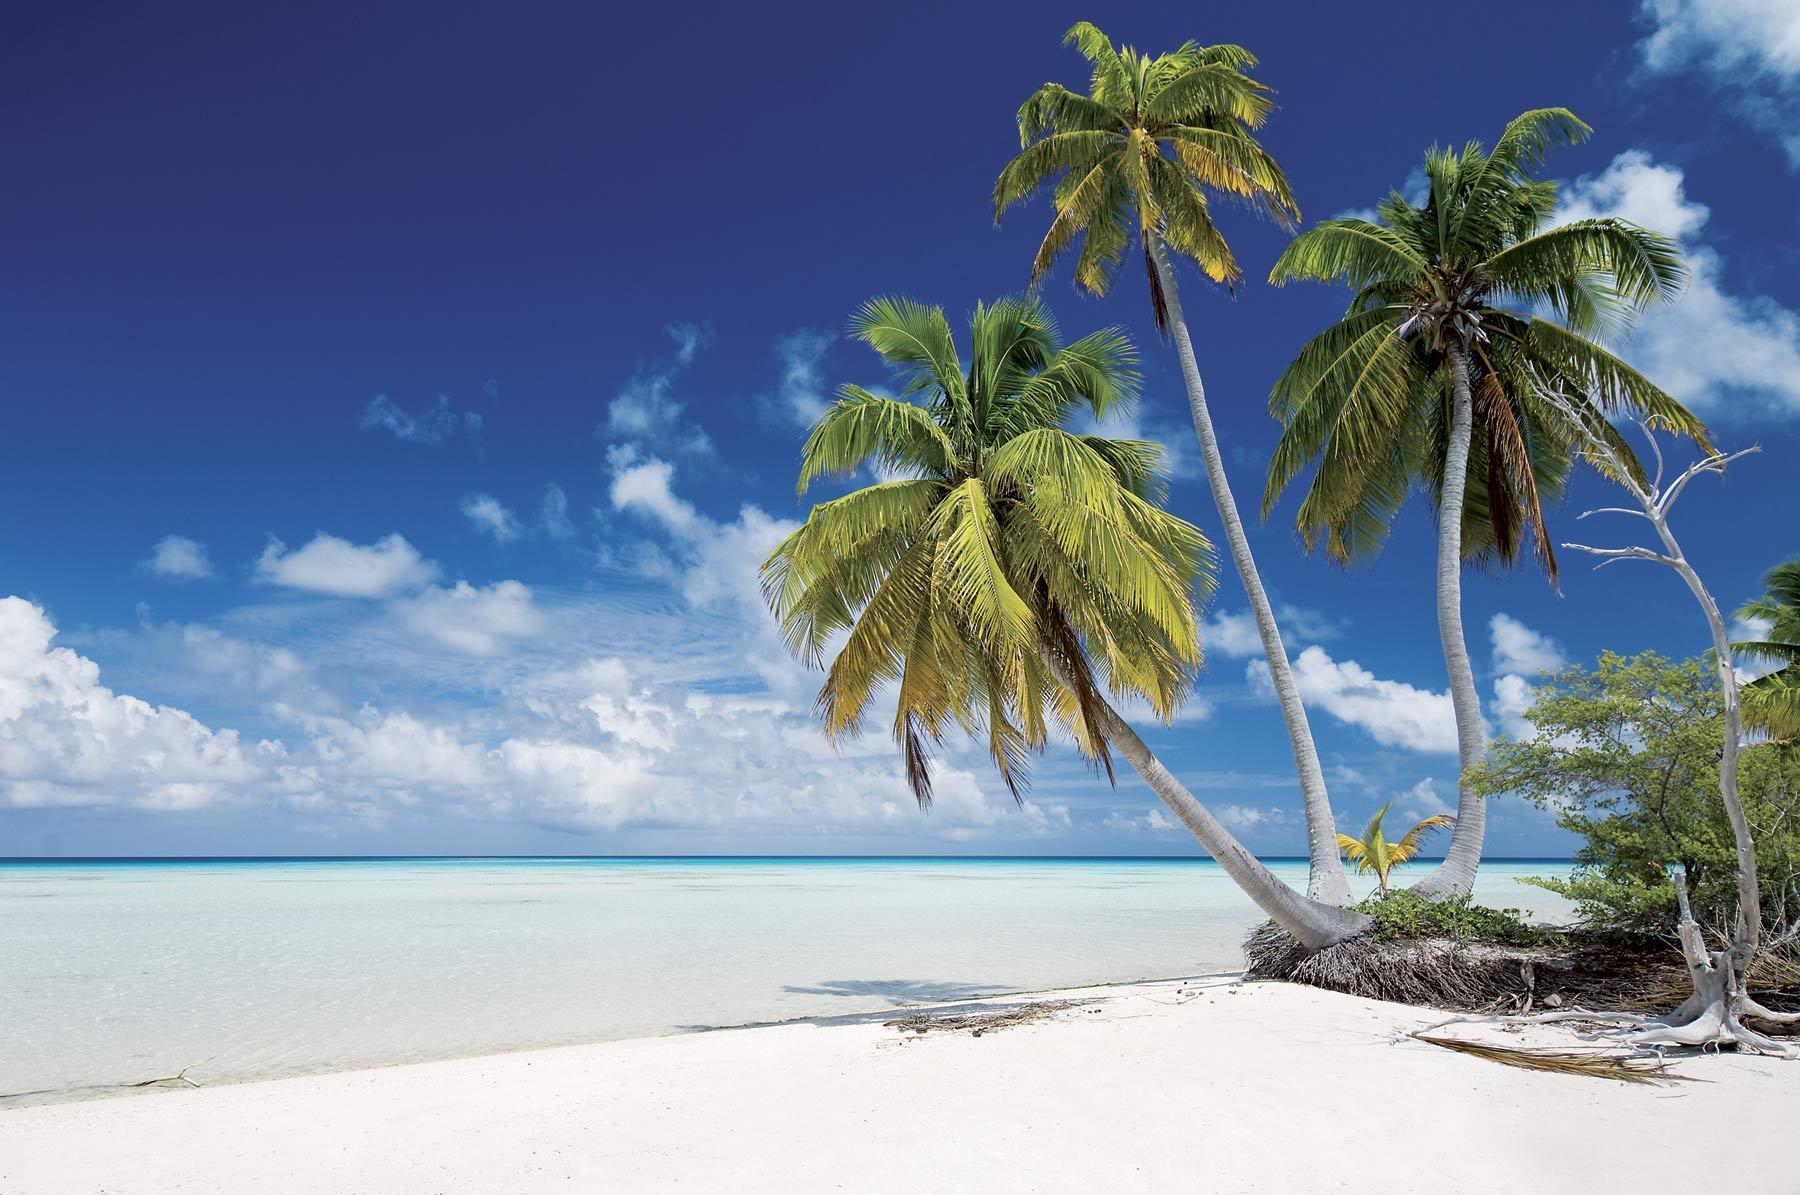 makemo-tuamotu-plage-lagon©P.Bacchet.jpg